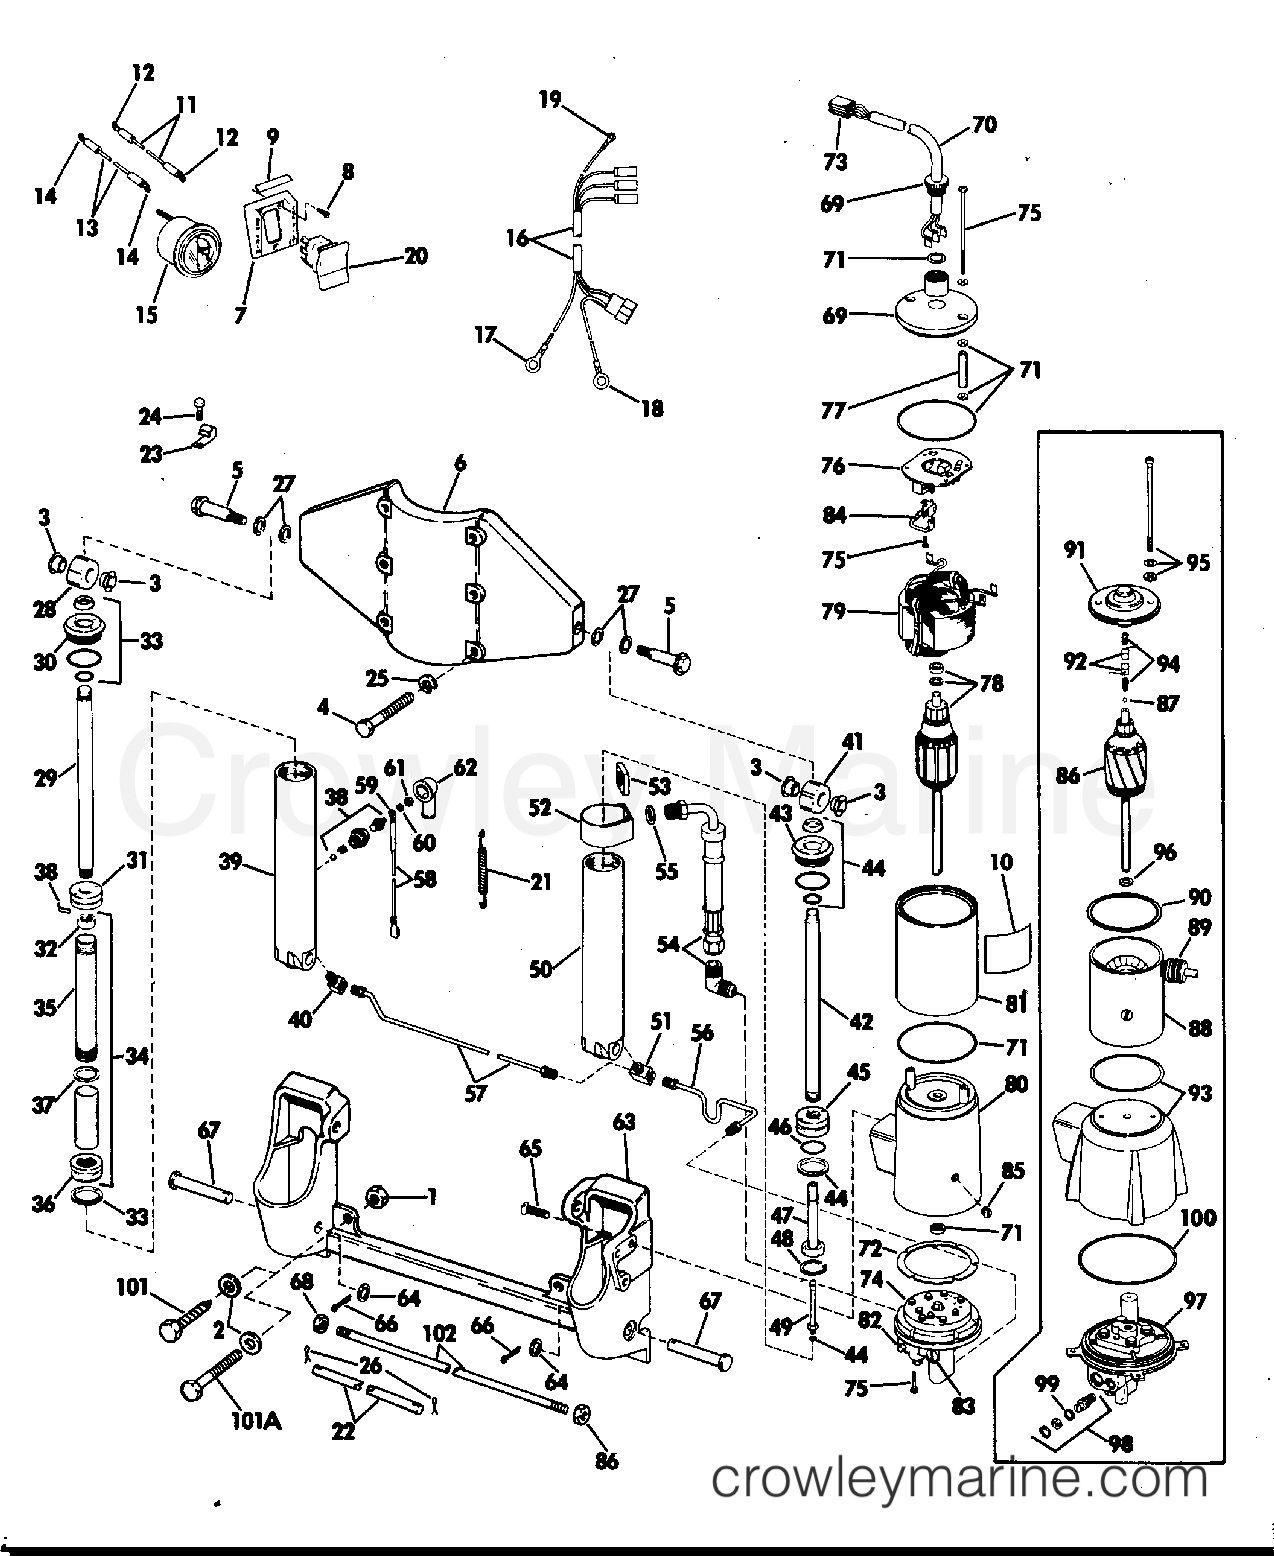 Mercury Tilt Trim Wiring Diagram | Wiring Library - Mercury Outboard Power Trim Wiring Diagram